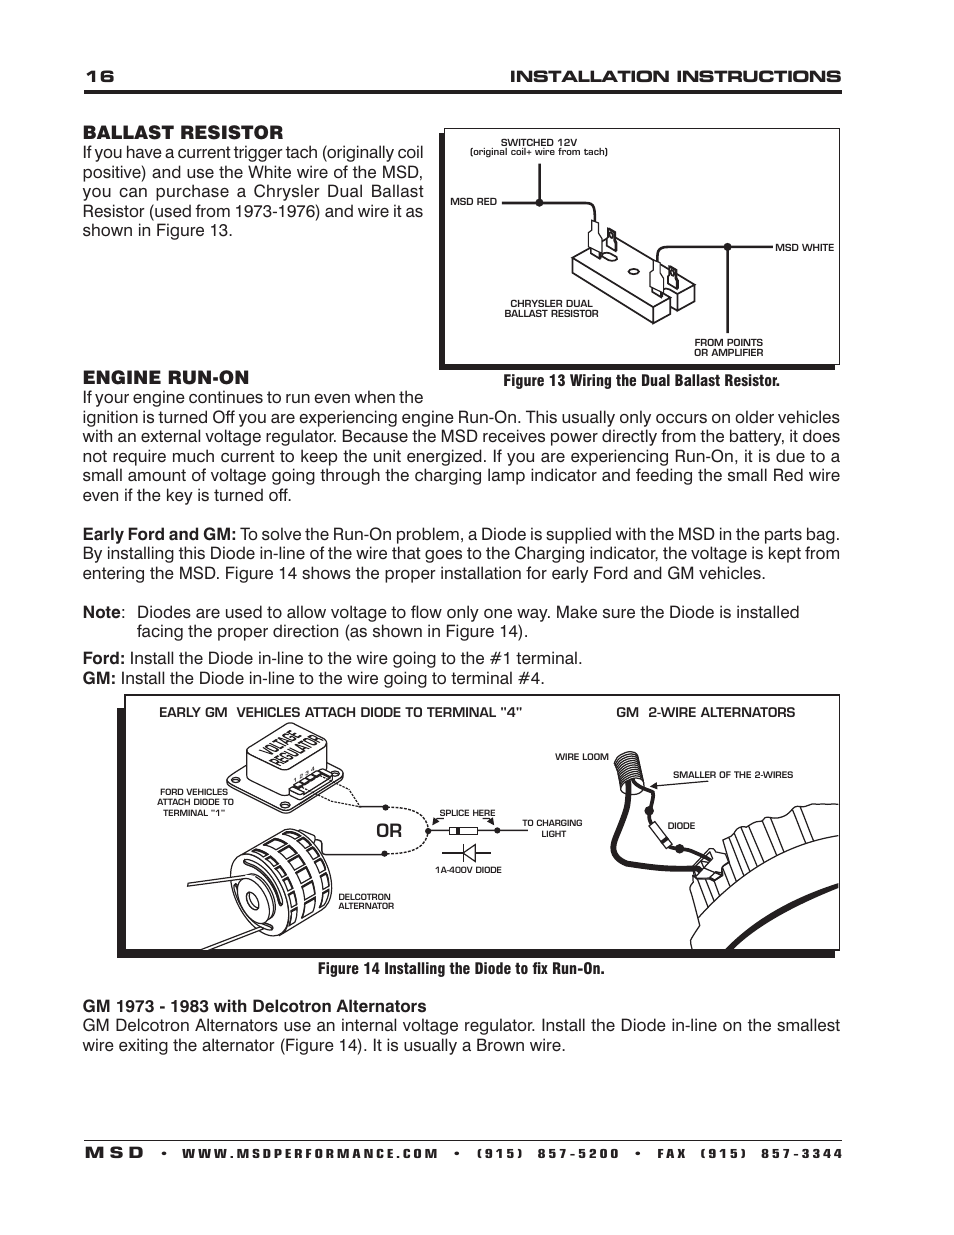 ballast resistor engine run on msd 6530 digital. Black Bedroom Furniture Sets. Home Design Ideas